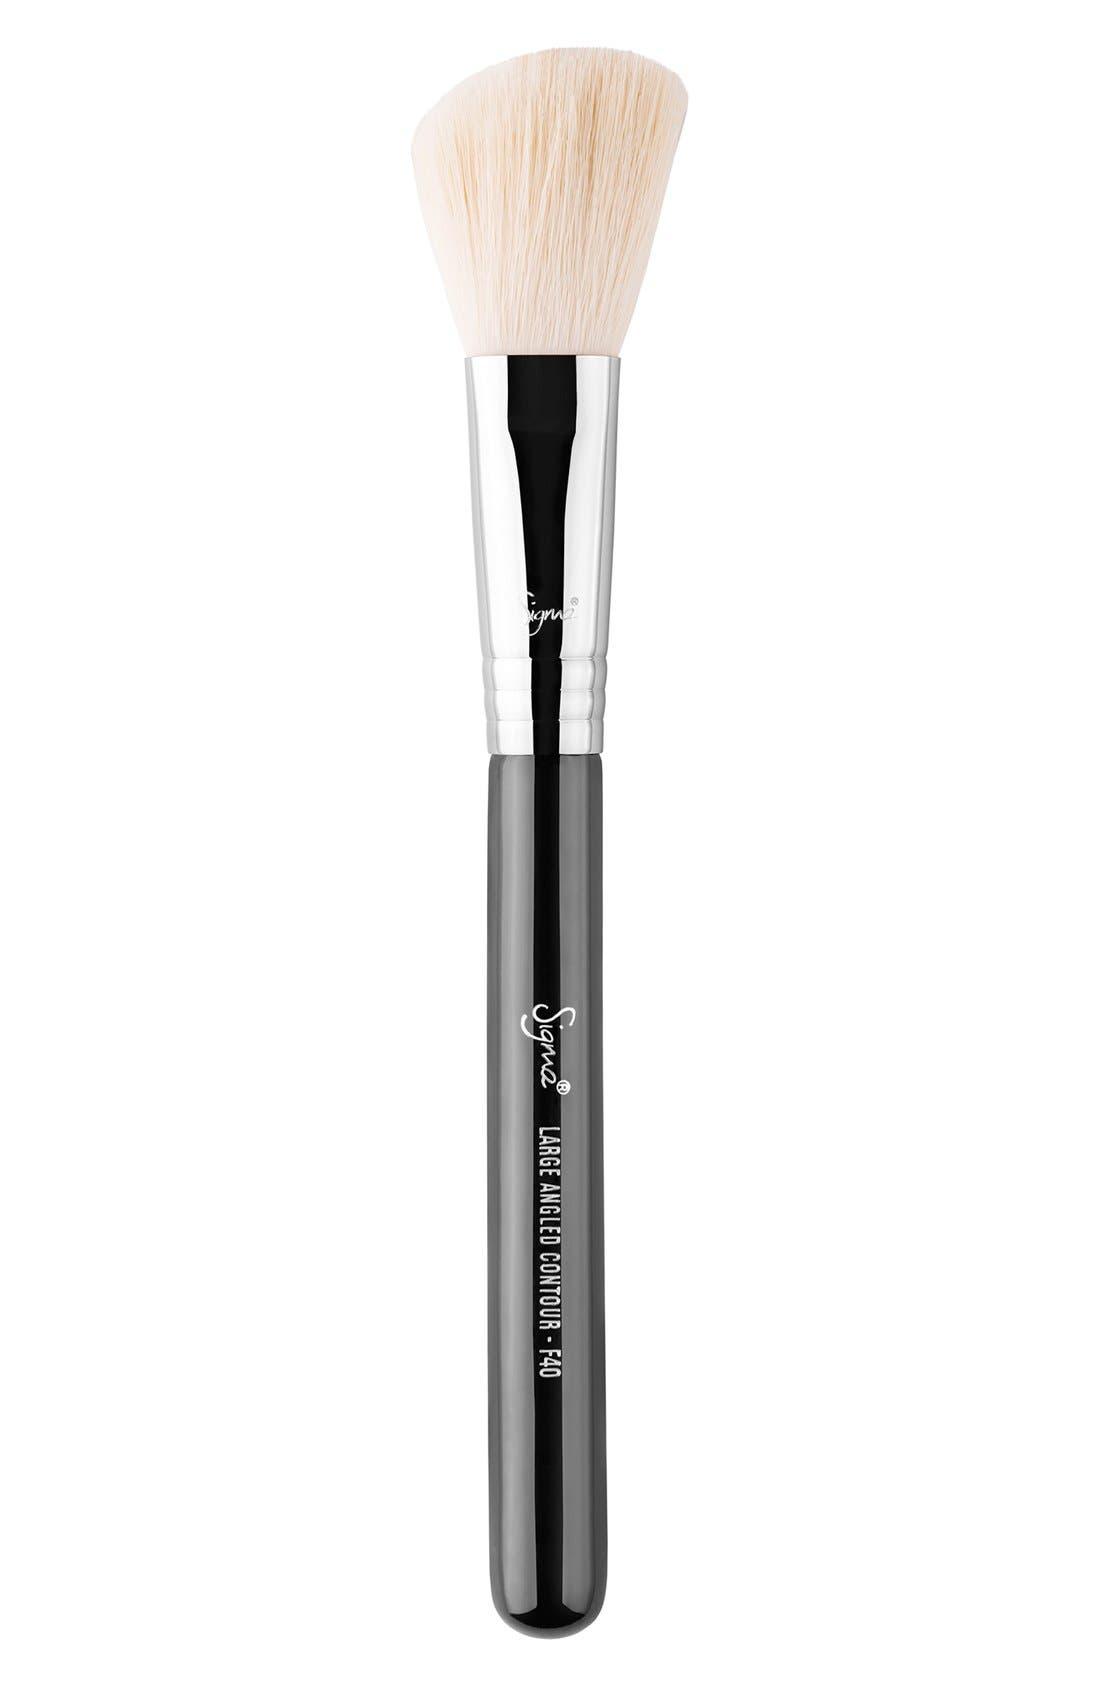 Sigma Beauty F40 Large Angled Contour Brush